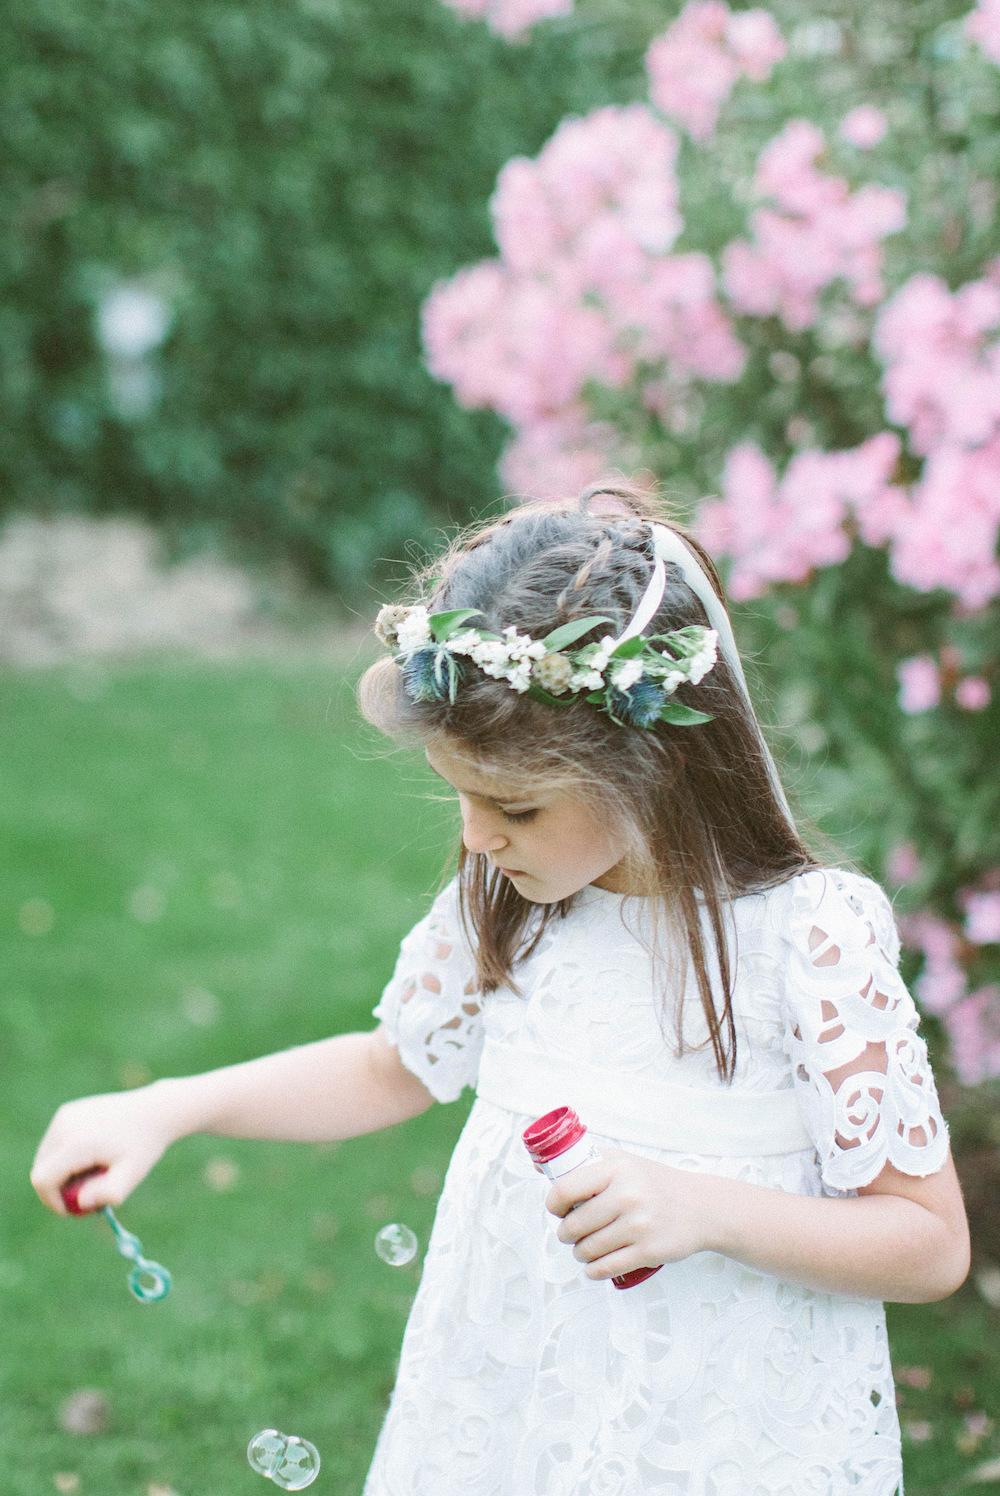 ©-saya-photography-studio-ohlala-wedding-photographer-photographe-mariage-lourmarin-avignon-provence-le-galinier-52.jpg